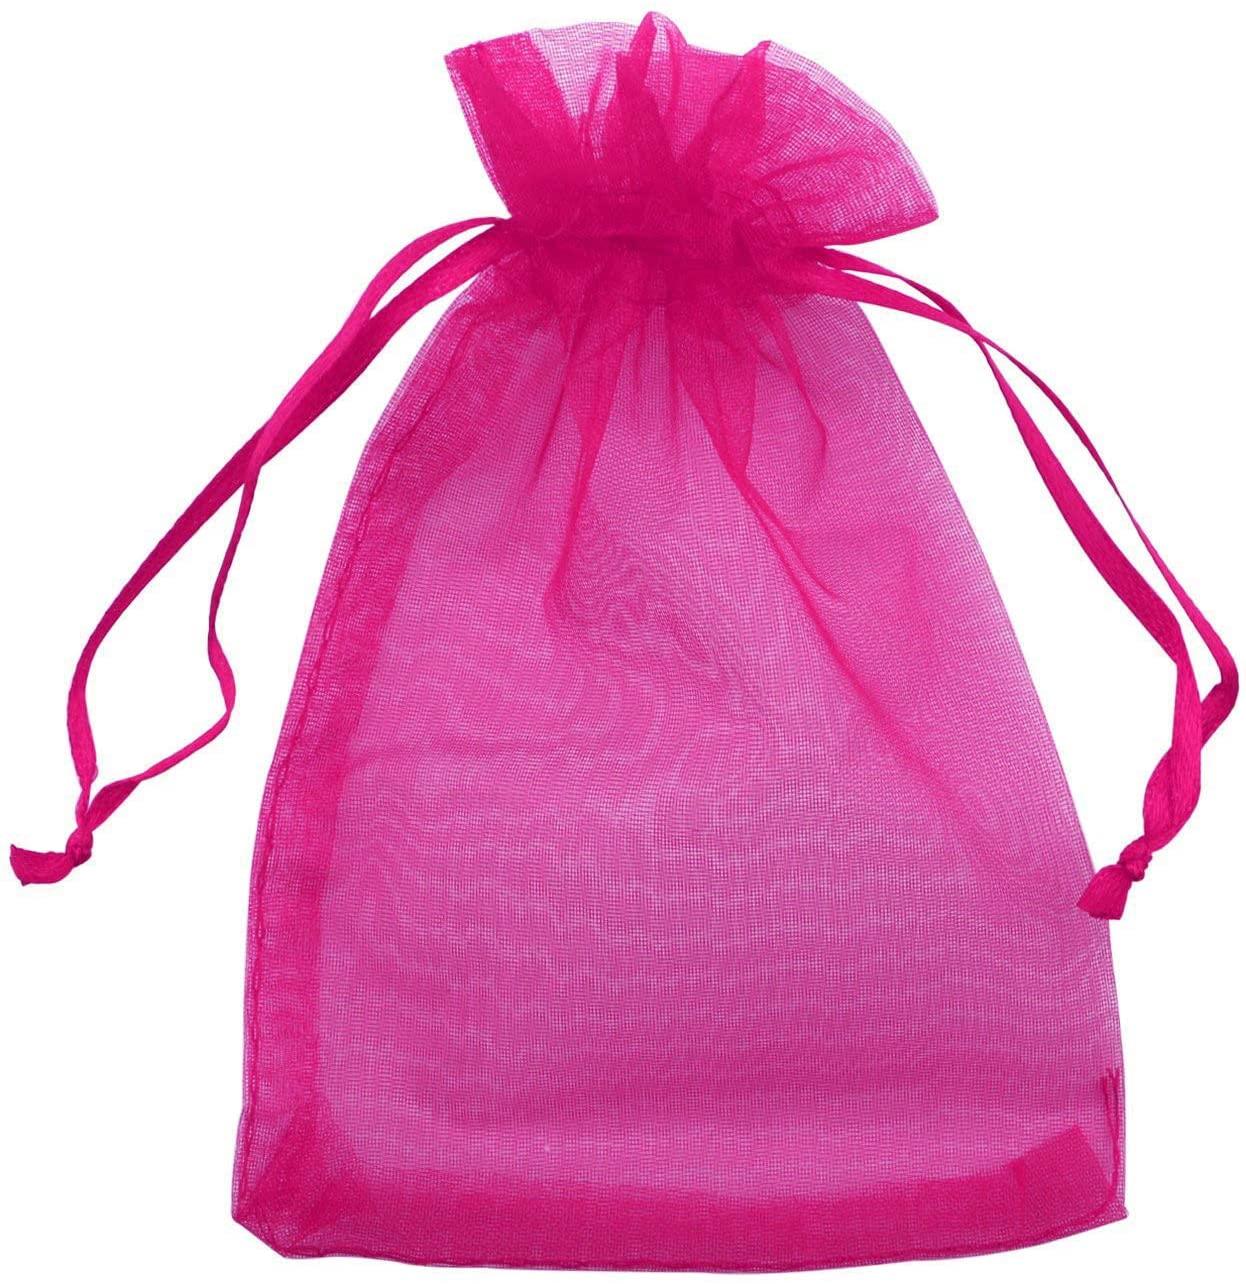 Allgala 100 Count Orangza Gift Party Favor Bags with Drawstring-4x6 Inch-Fuchsia-PF53111